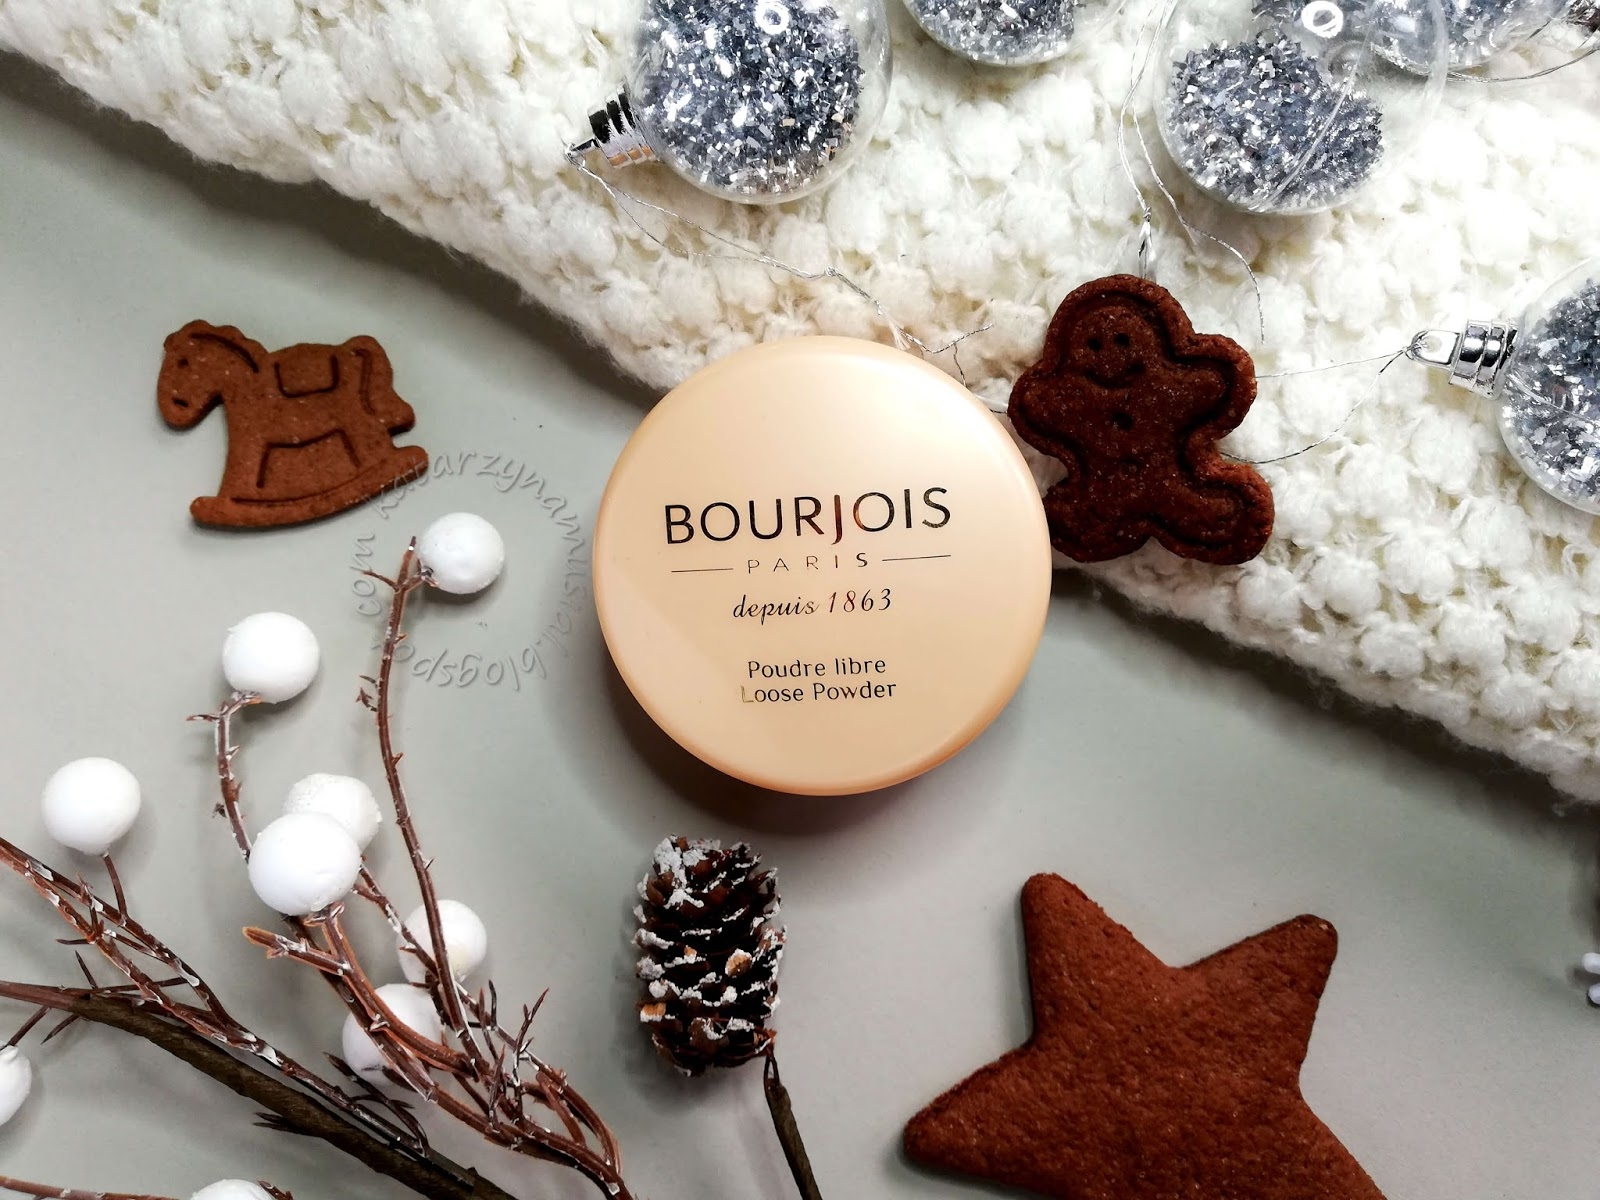 Puder sypki Bourjois - luksus za grosze?